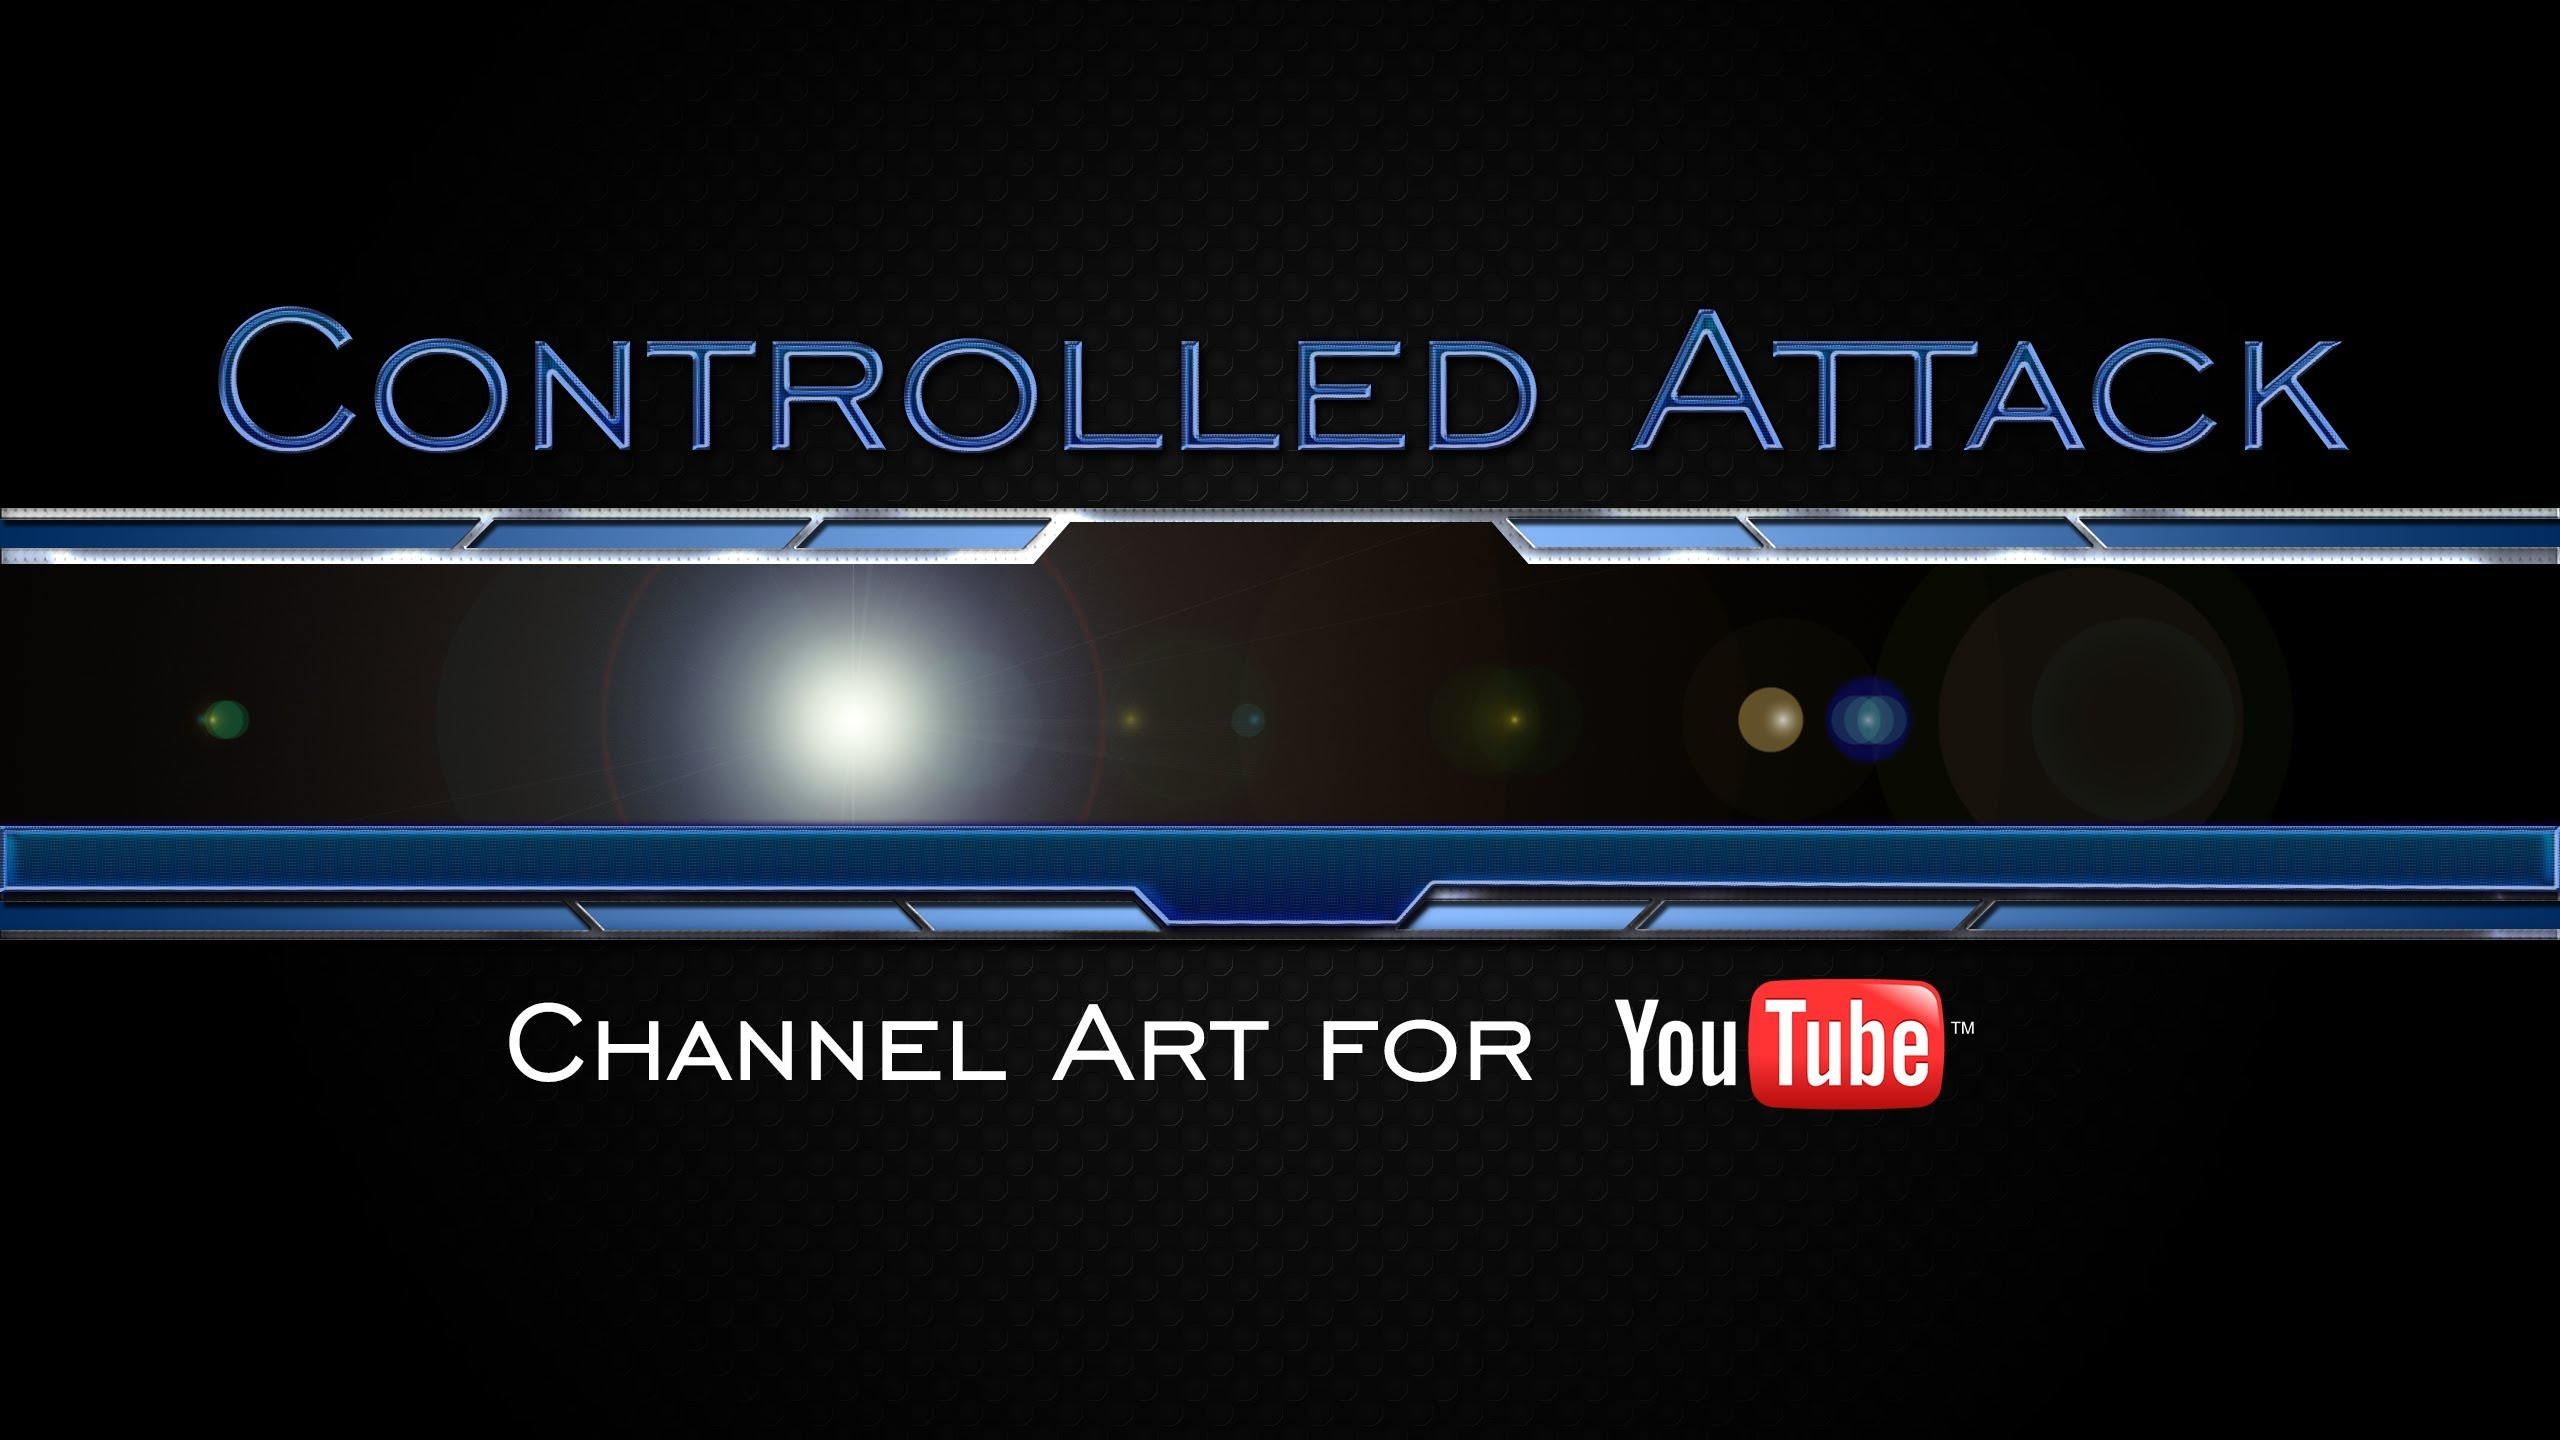 YouTube Banner Wallpaper 2560x1440